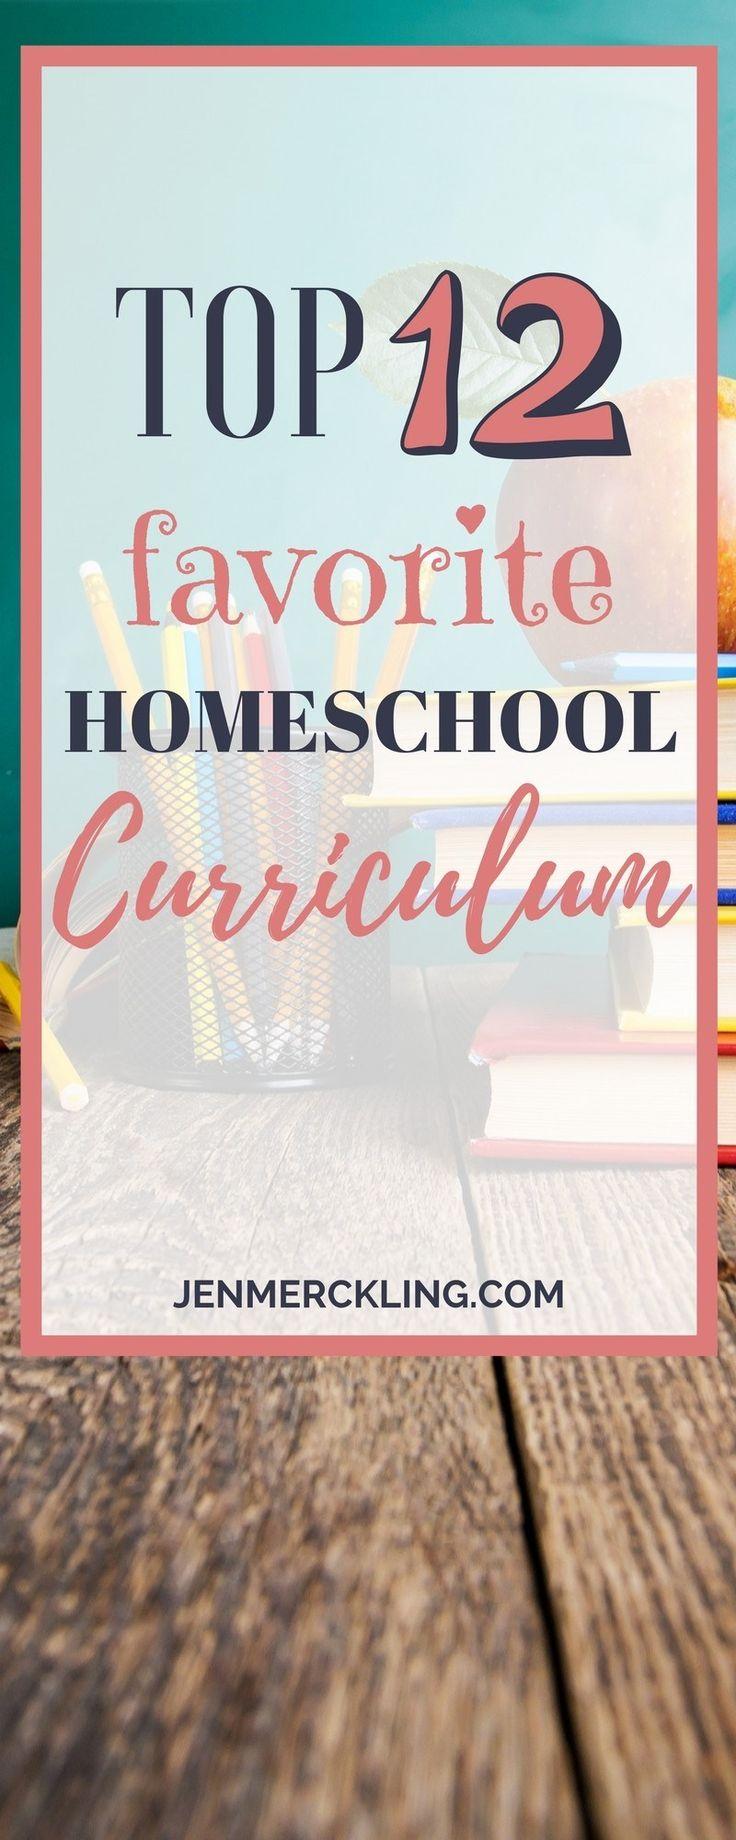 655 Best Homeschool Curriculum Choices Images On Pinterest